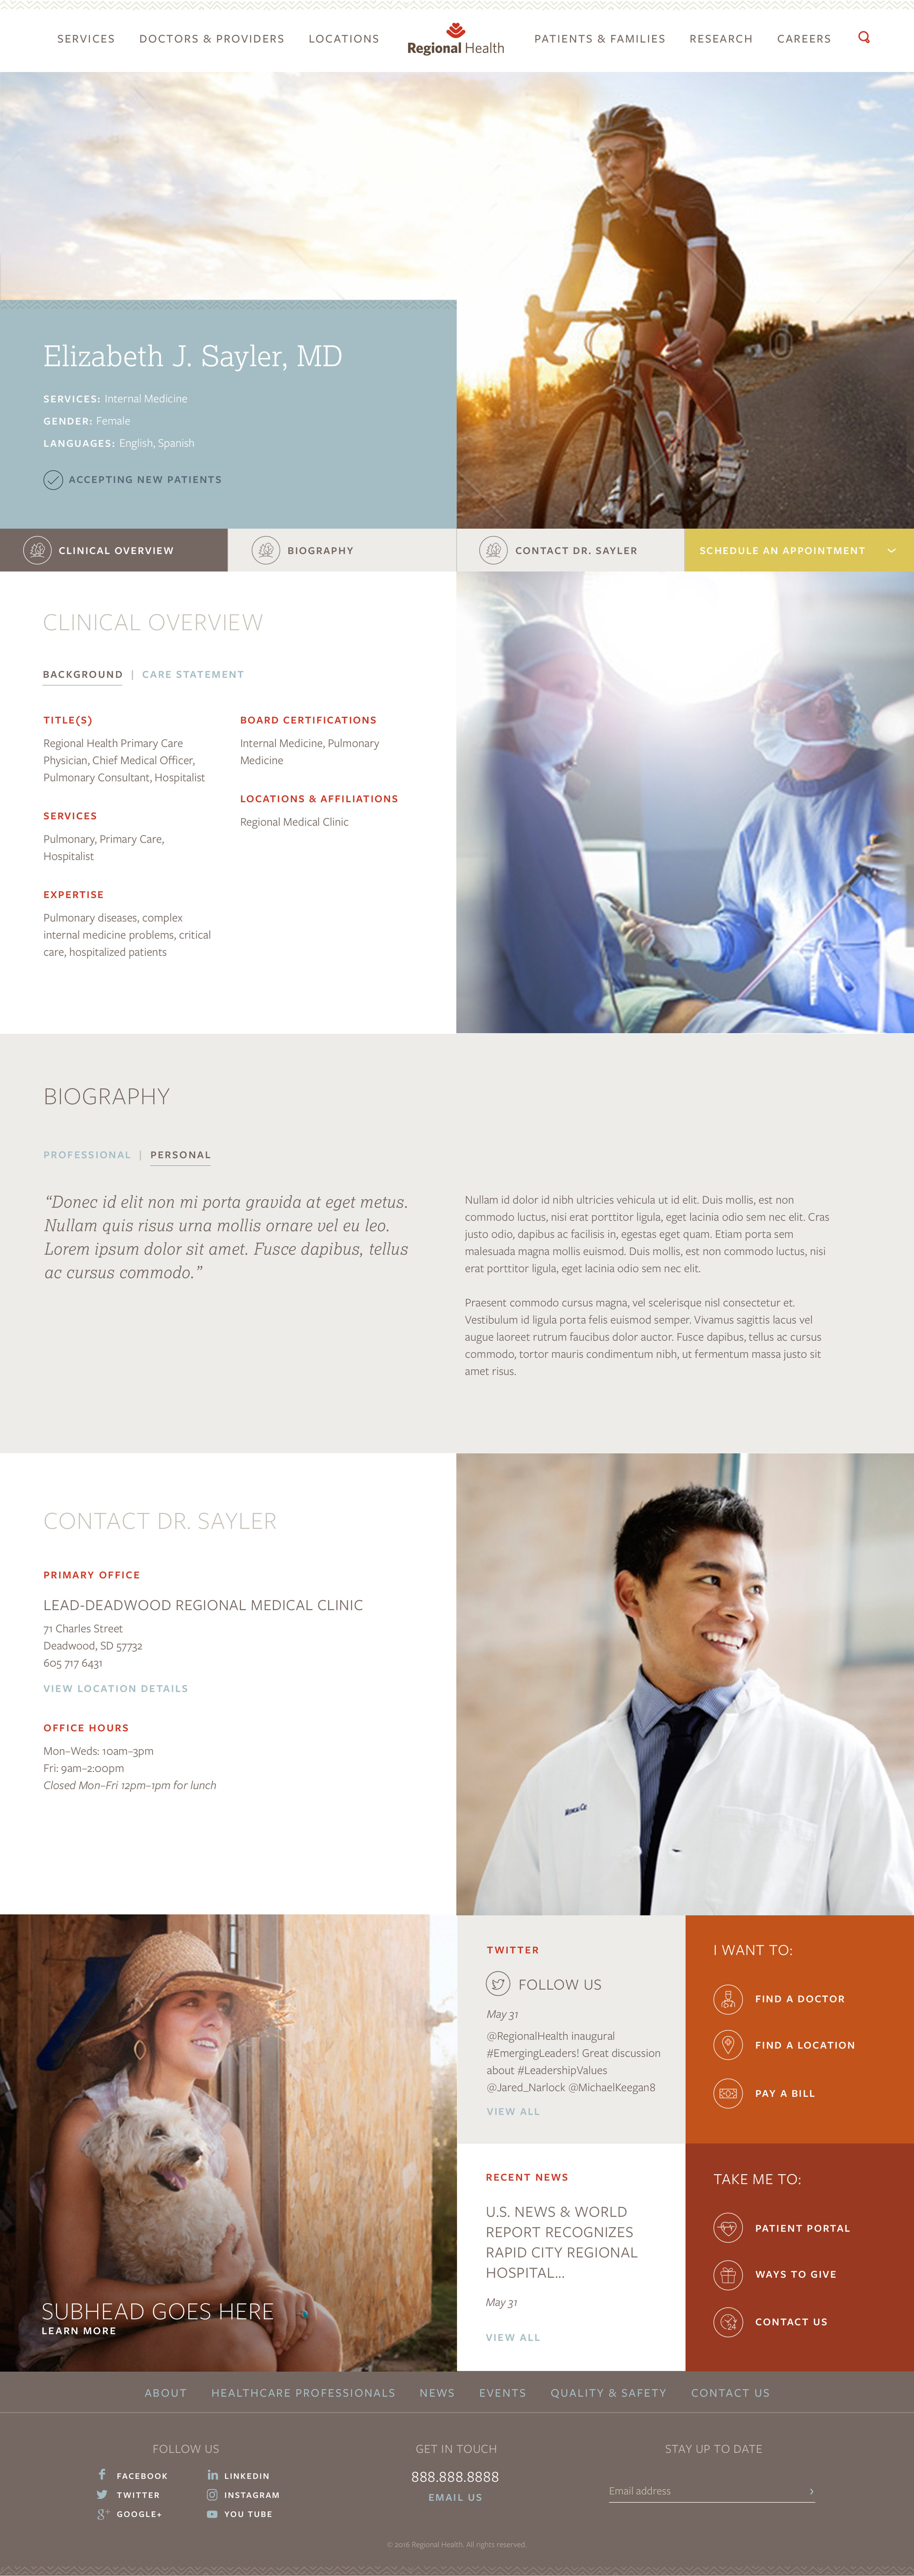 RHS_Doc-Profile-Large-Desktop-2@2x.jpg